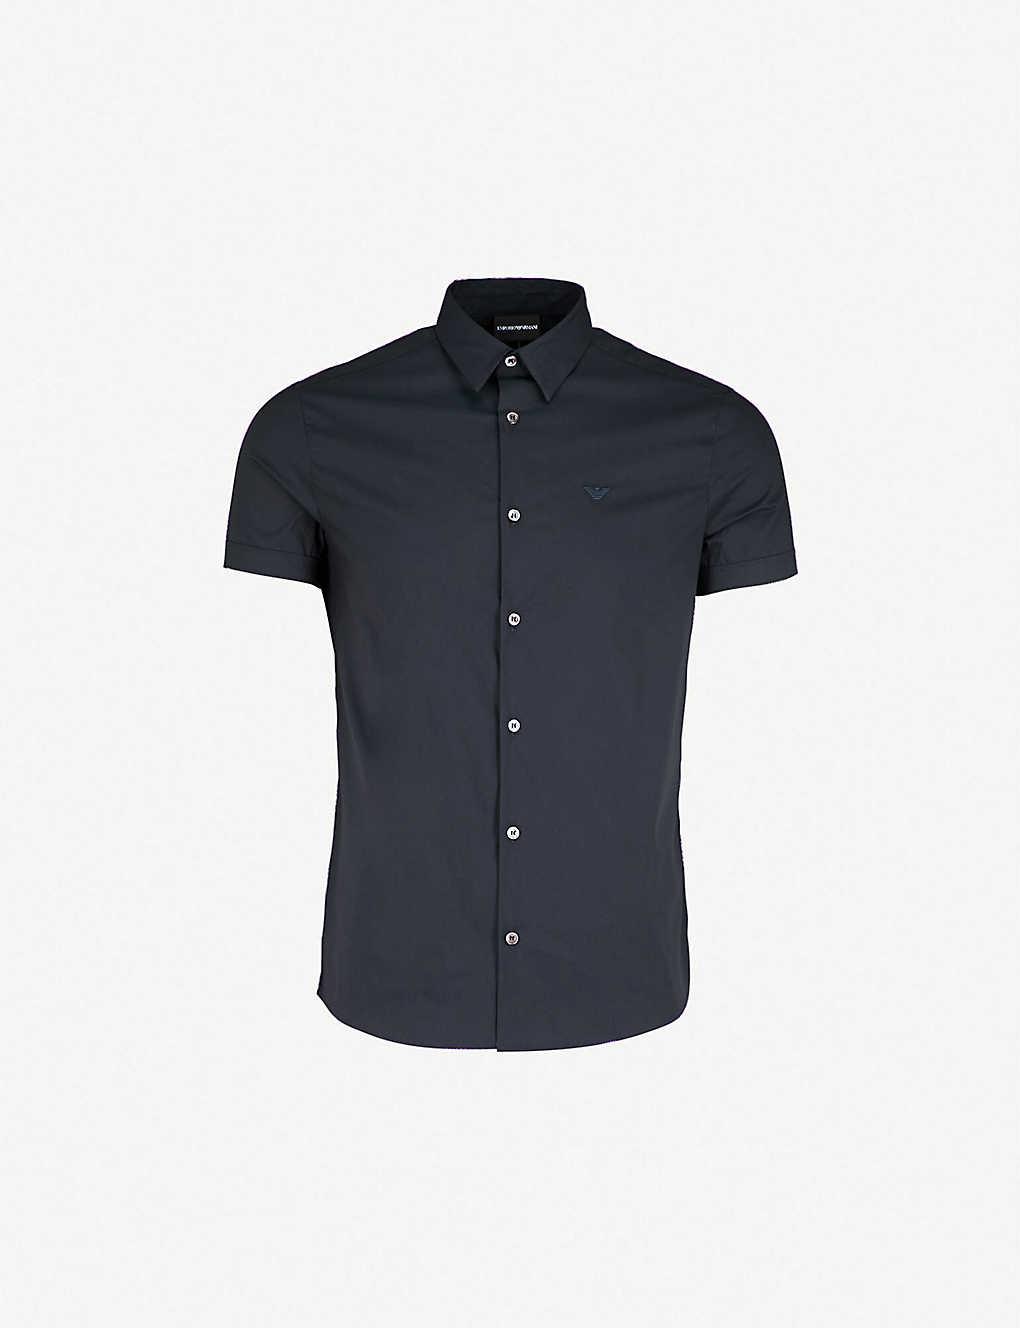 31c8b4e1 Short-sleeved slim-fit poplin shirt